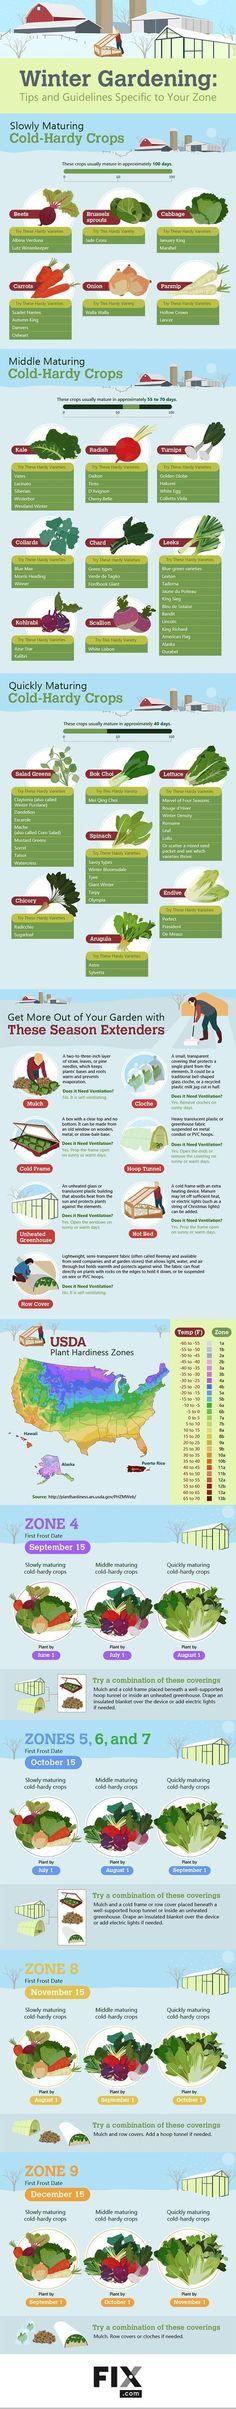 How to Grow Food 365